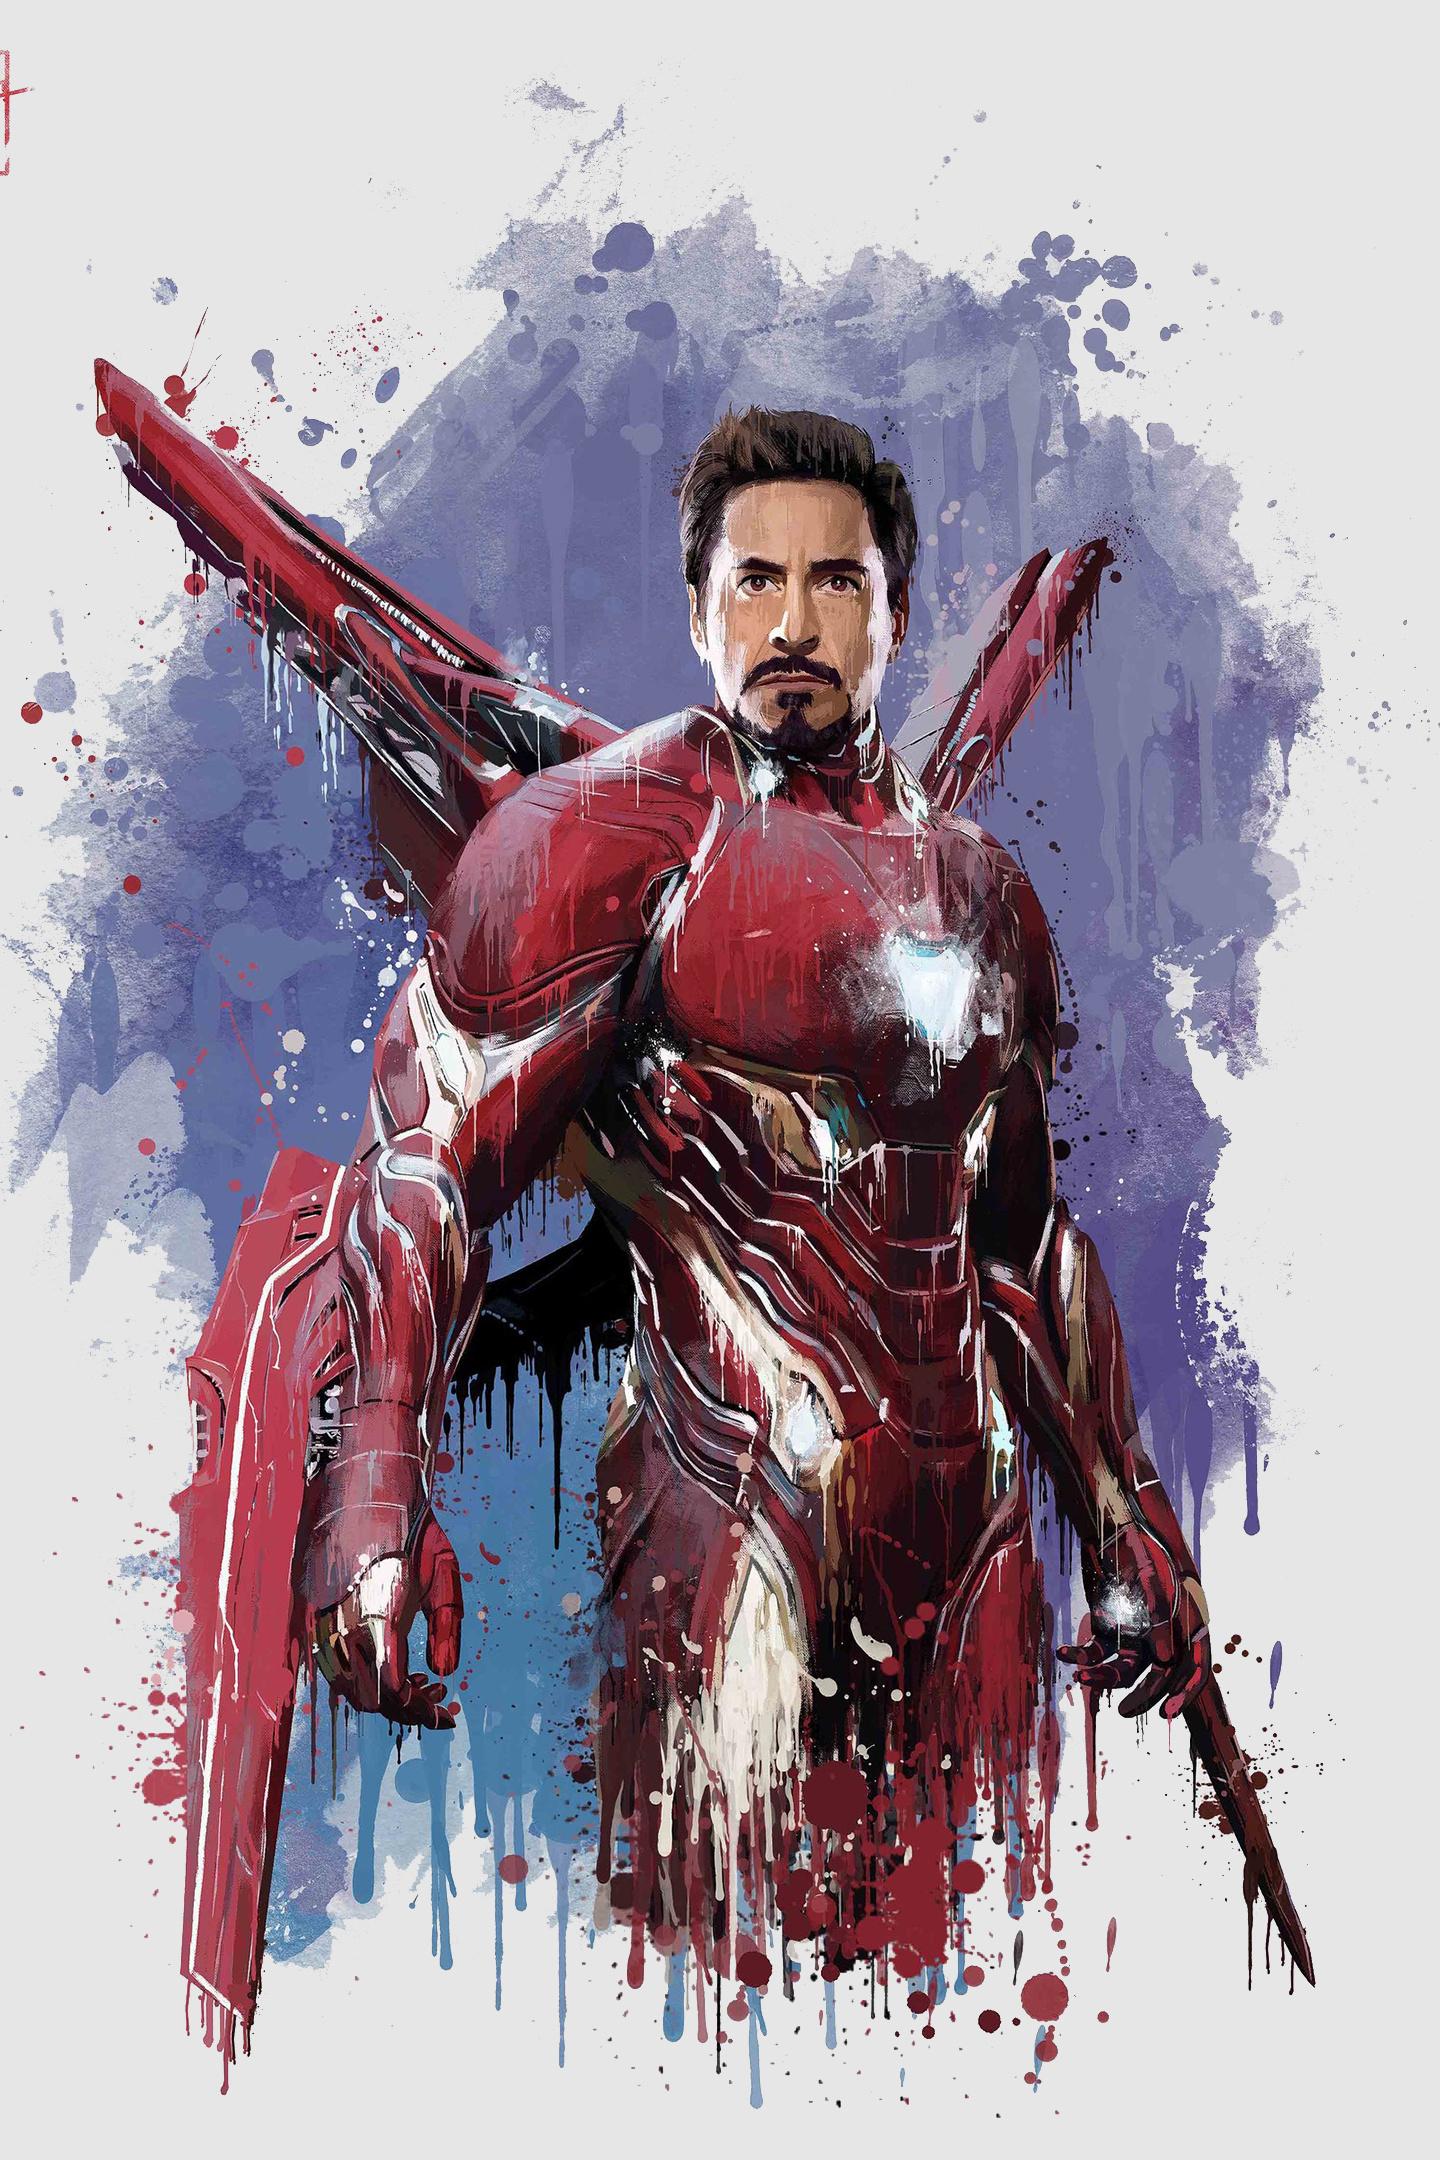 Download 1440x2880 Wallpaper Iron Man New Suit Avengers